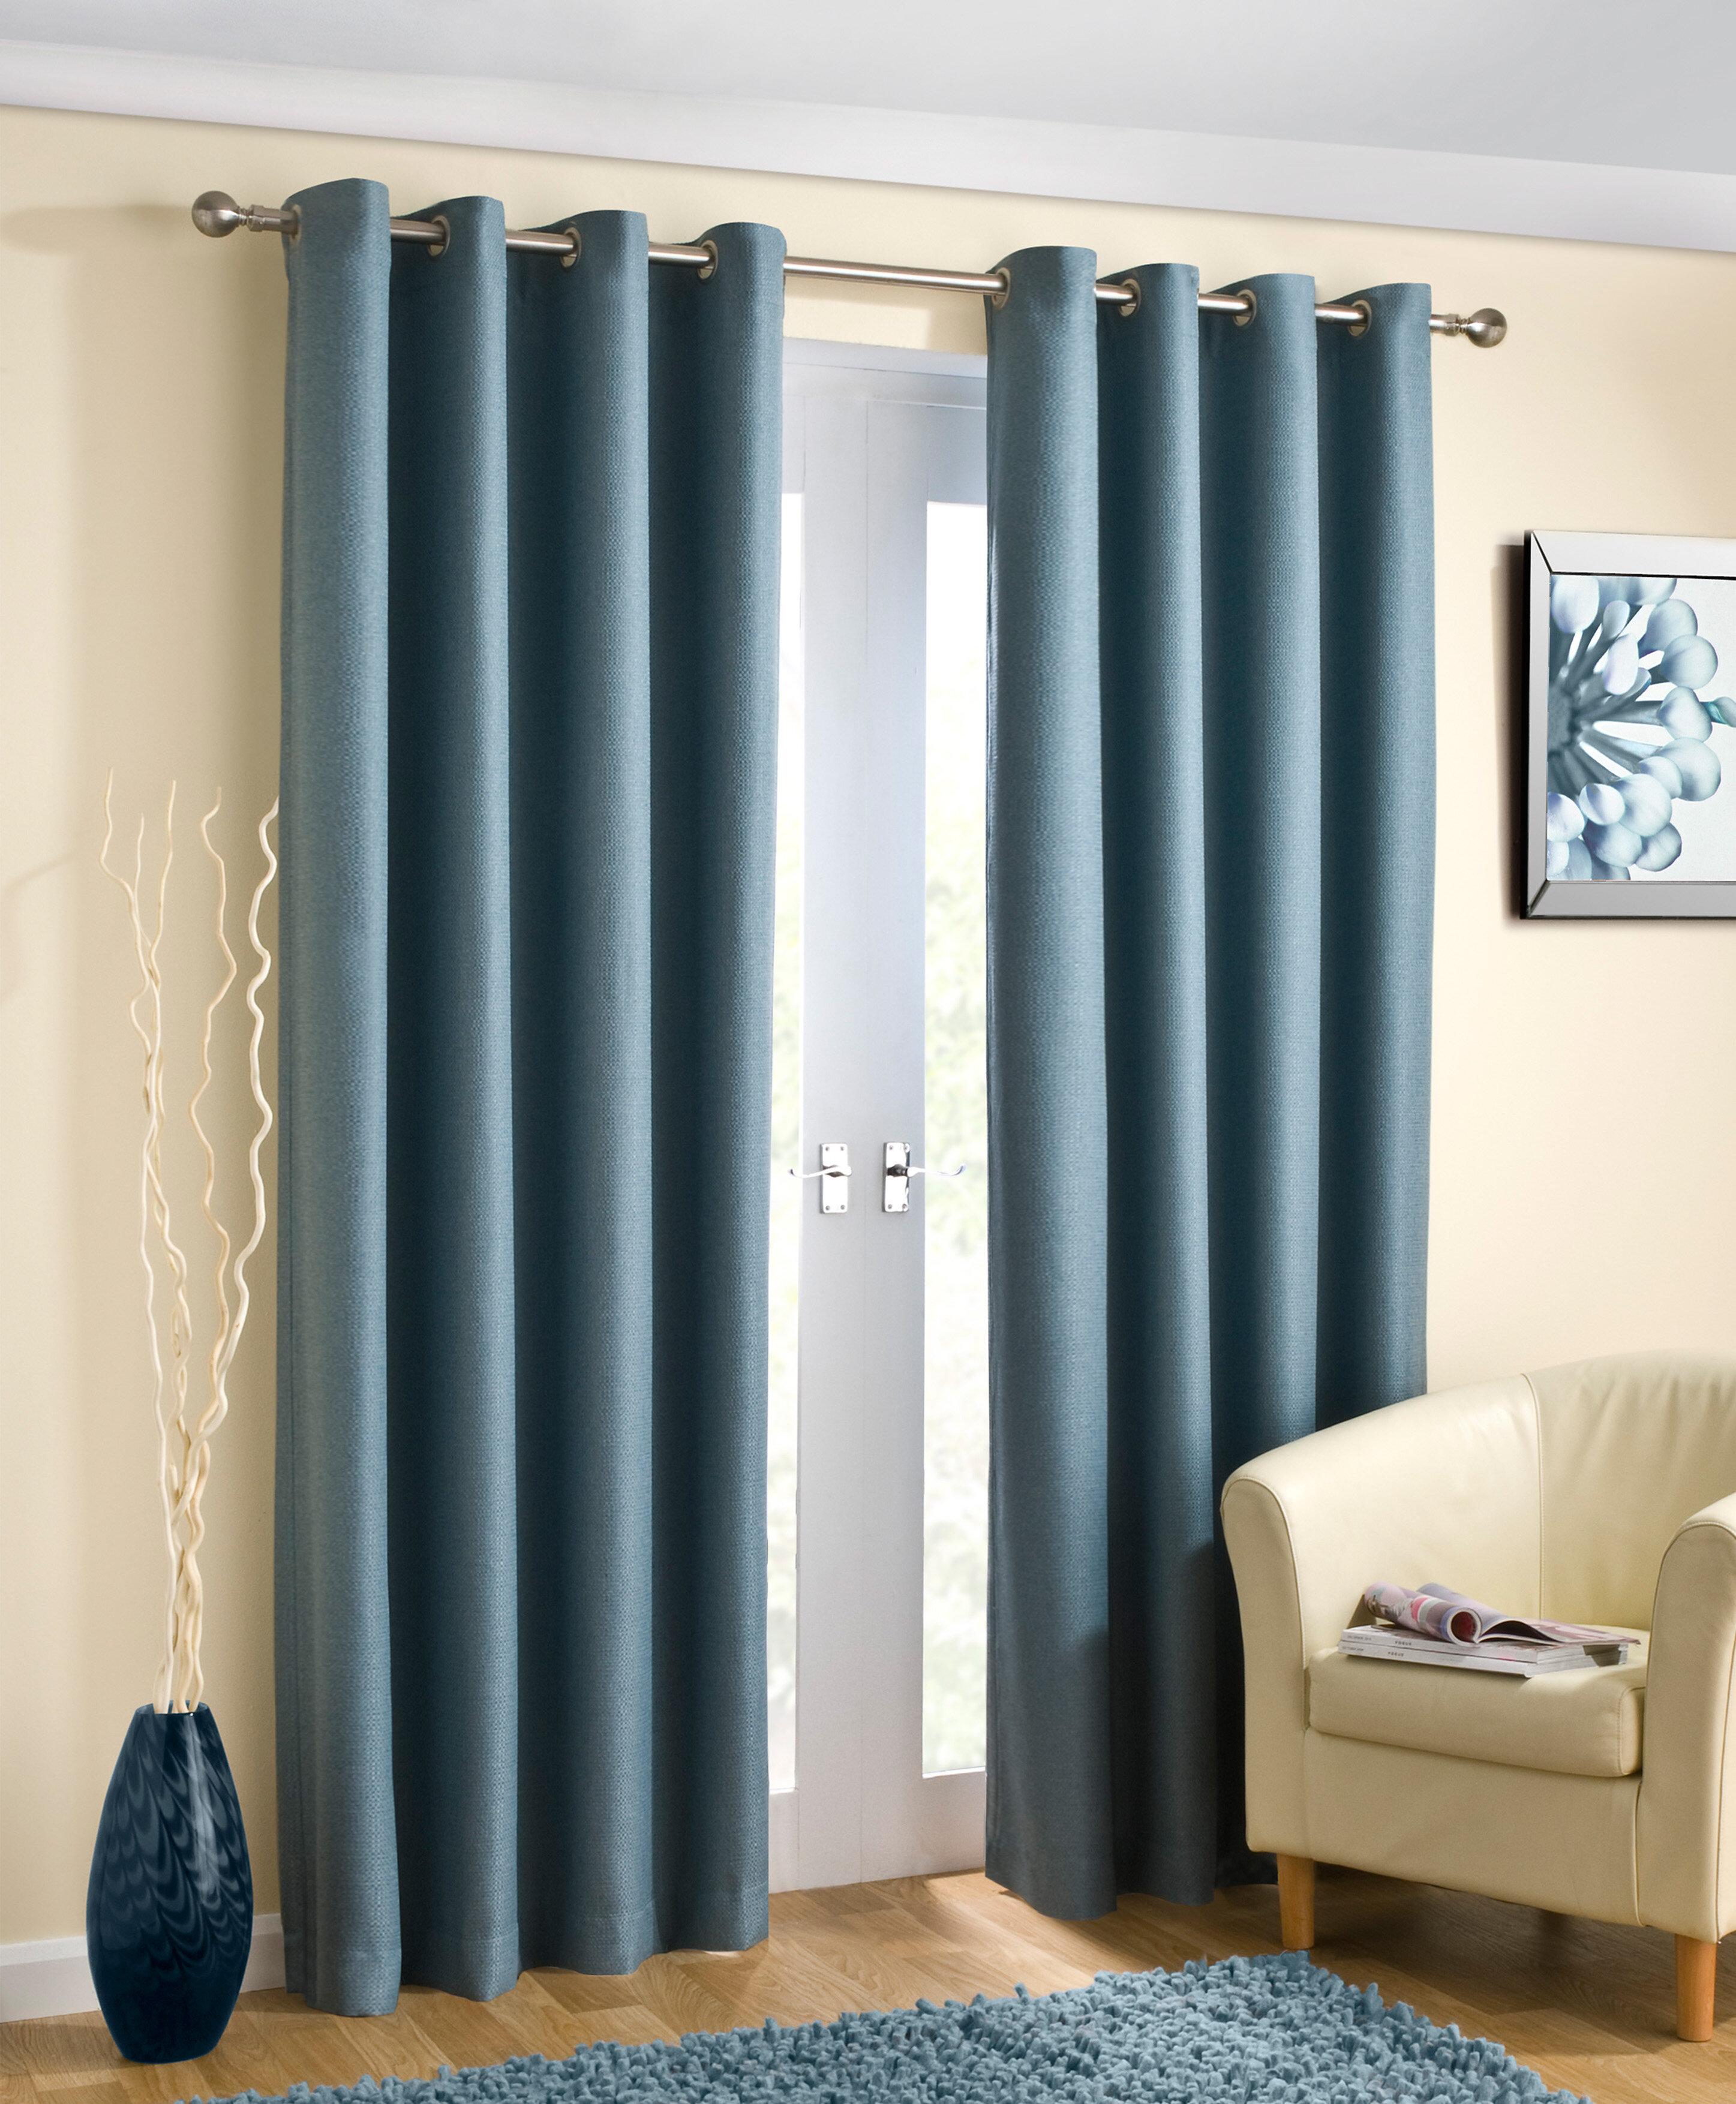 aqua blue blackout curtains curtain thermal louisiana pleat light pencil lined